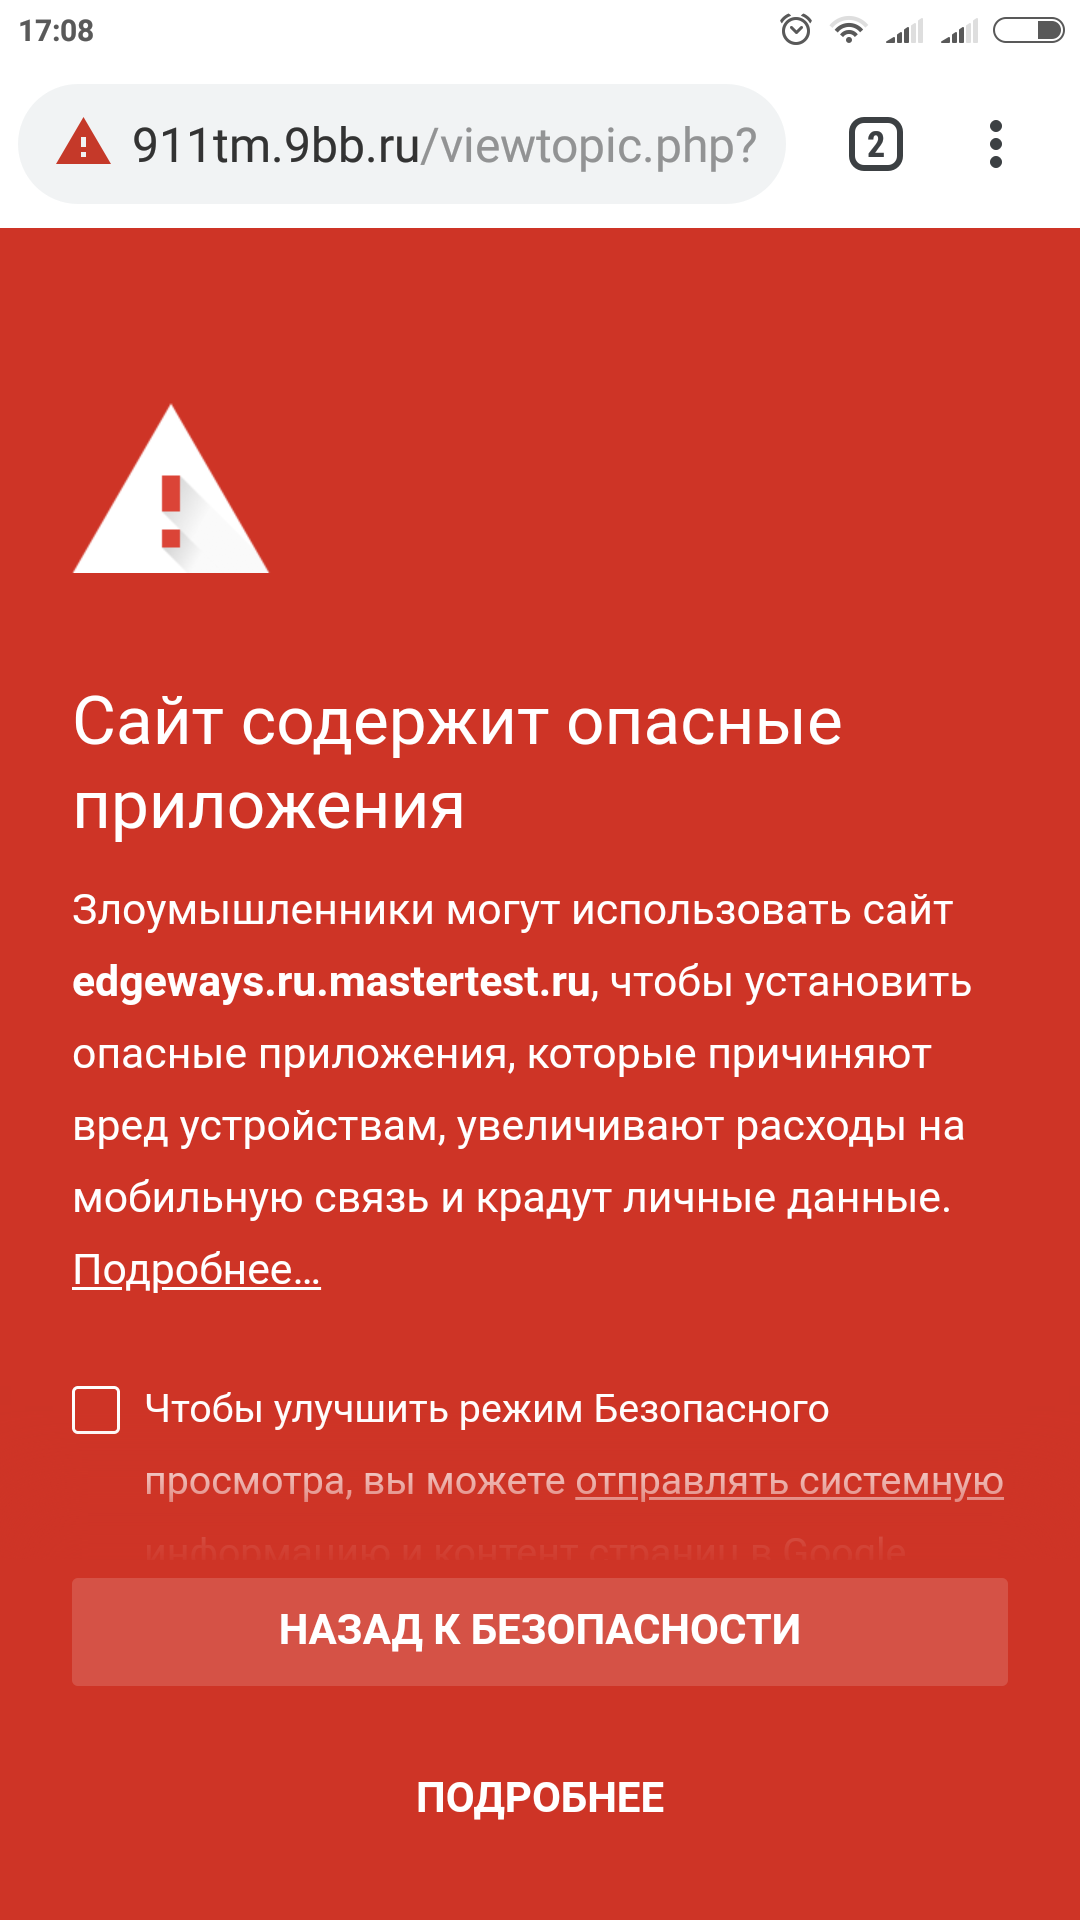 http://images.vfl.ru/ii/1537272646/14c21ca6/23388580.png